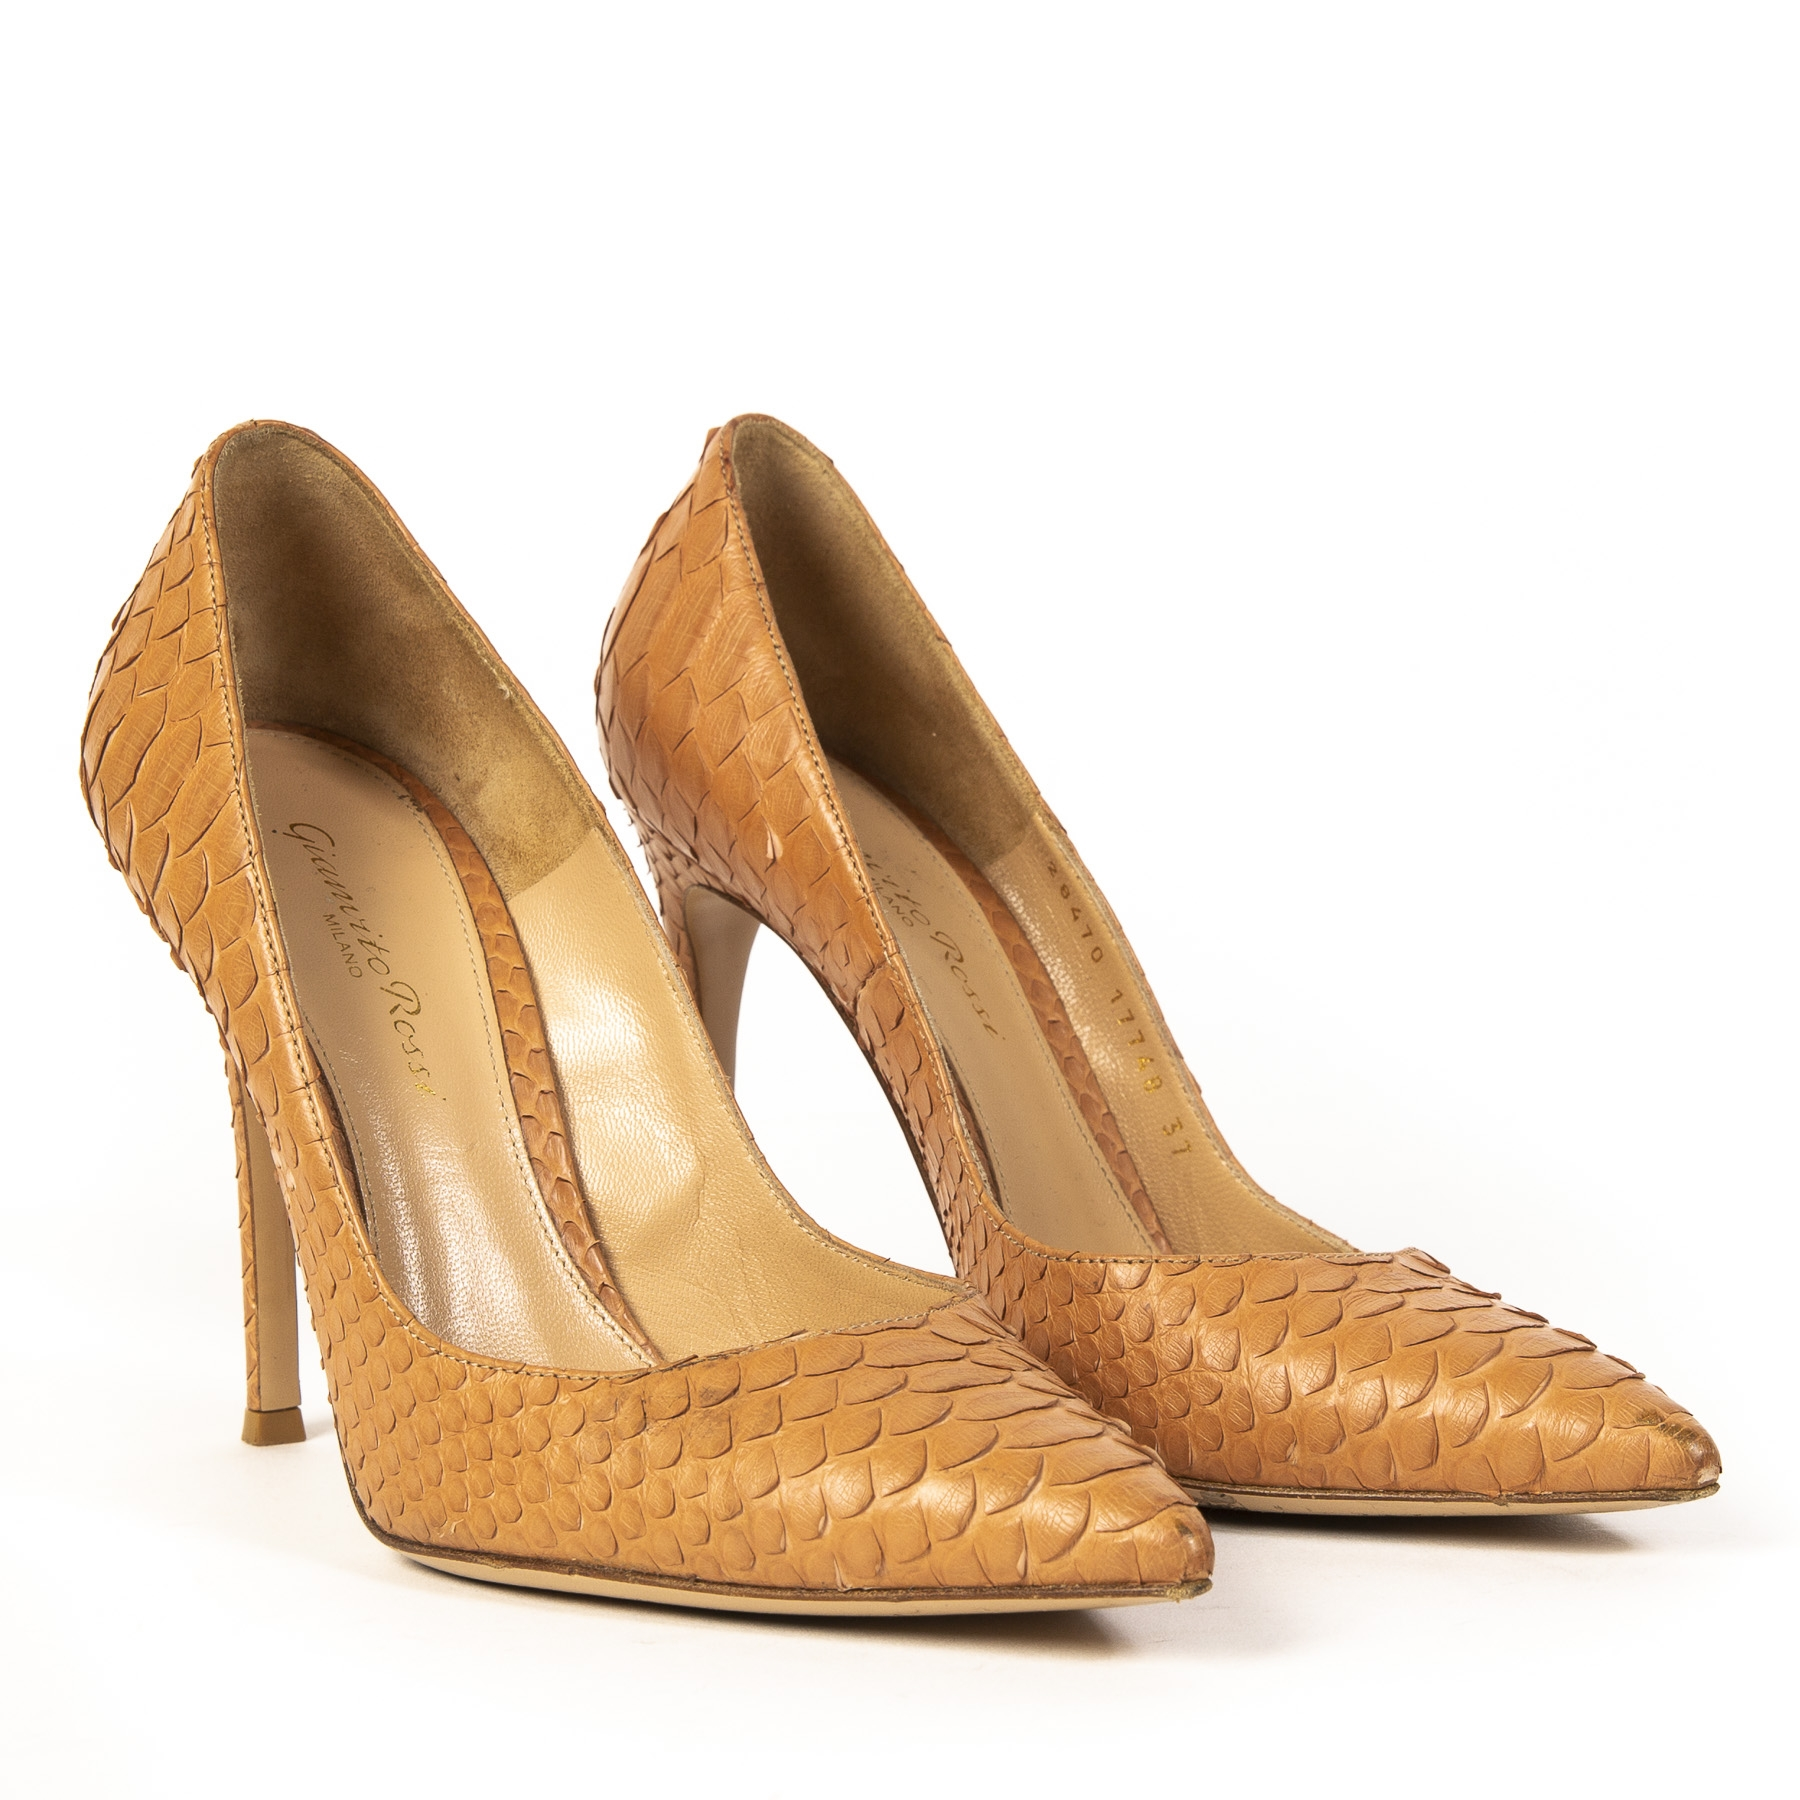 379cd7c86a Labellov Shop Vintage Luxury Designer Handbags & Fashion & Shoes ...